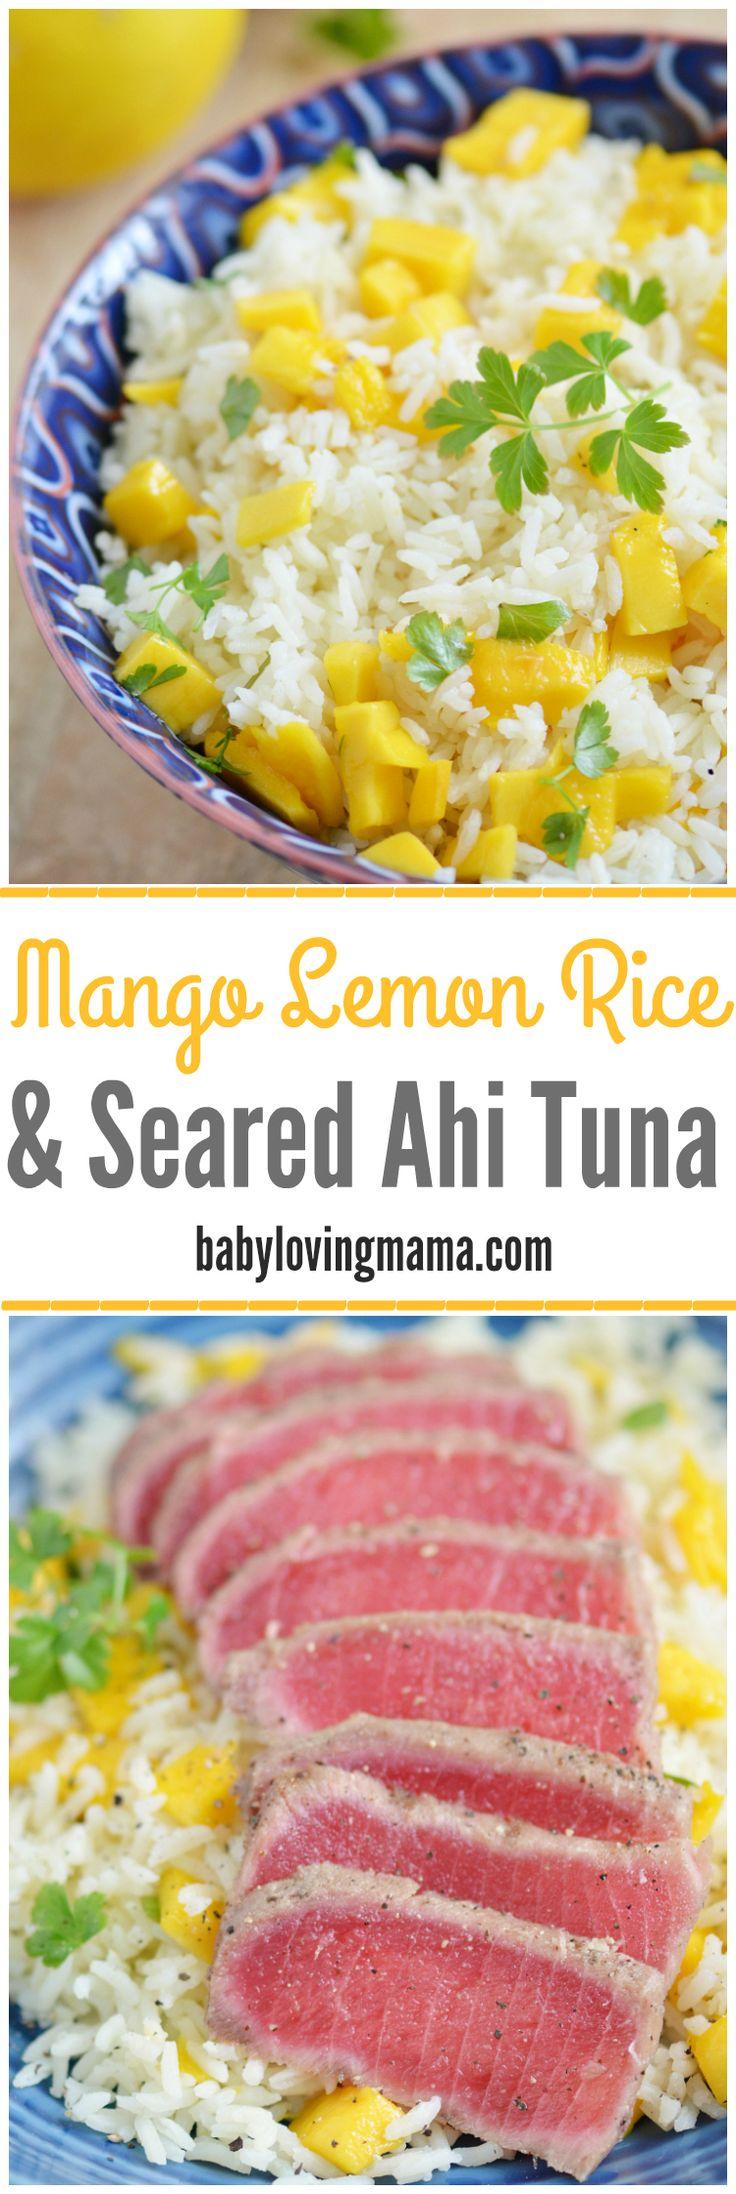 Best 25 seared tuna ideas on pinterest seared tuna for Fish and rice recipes